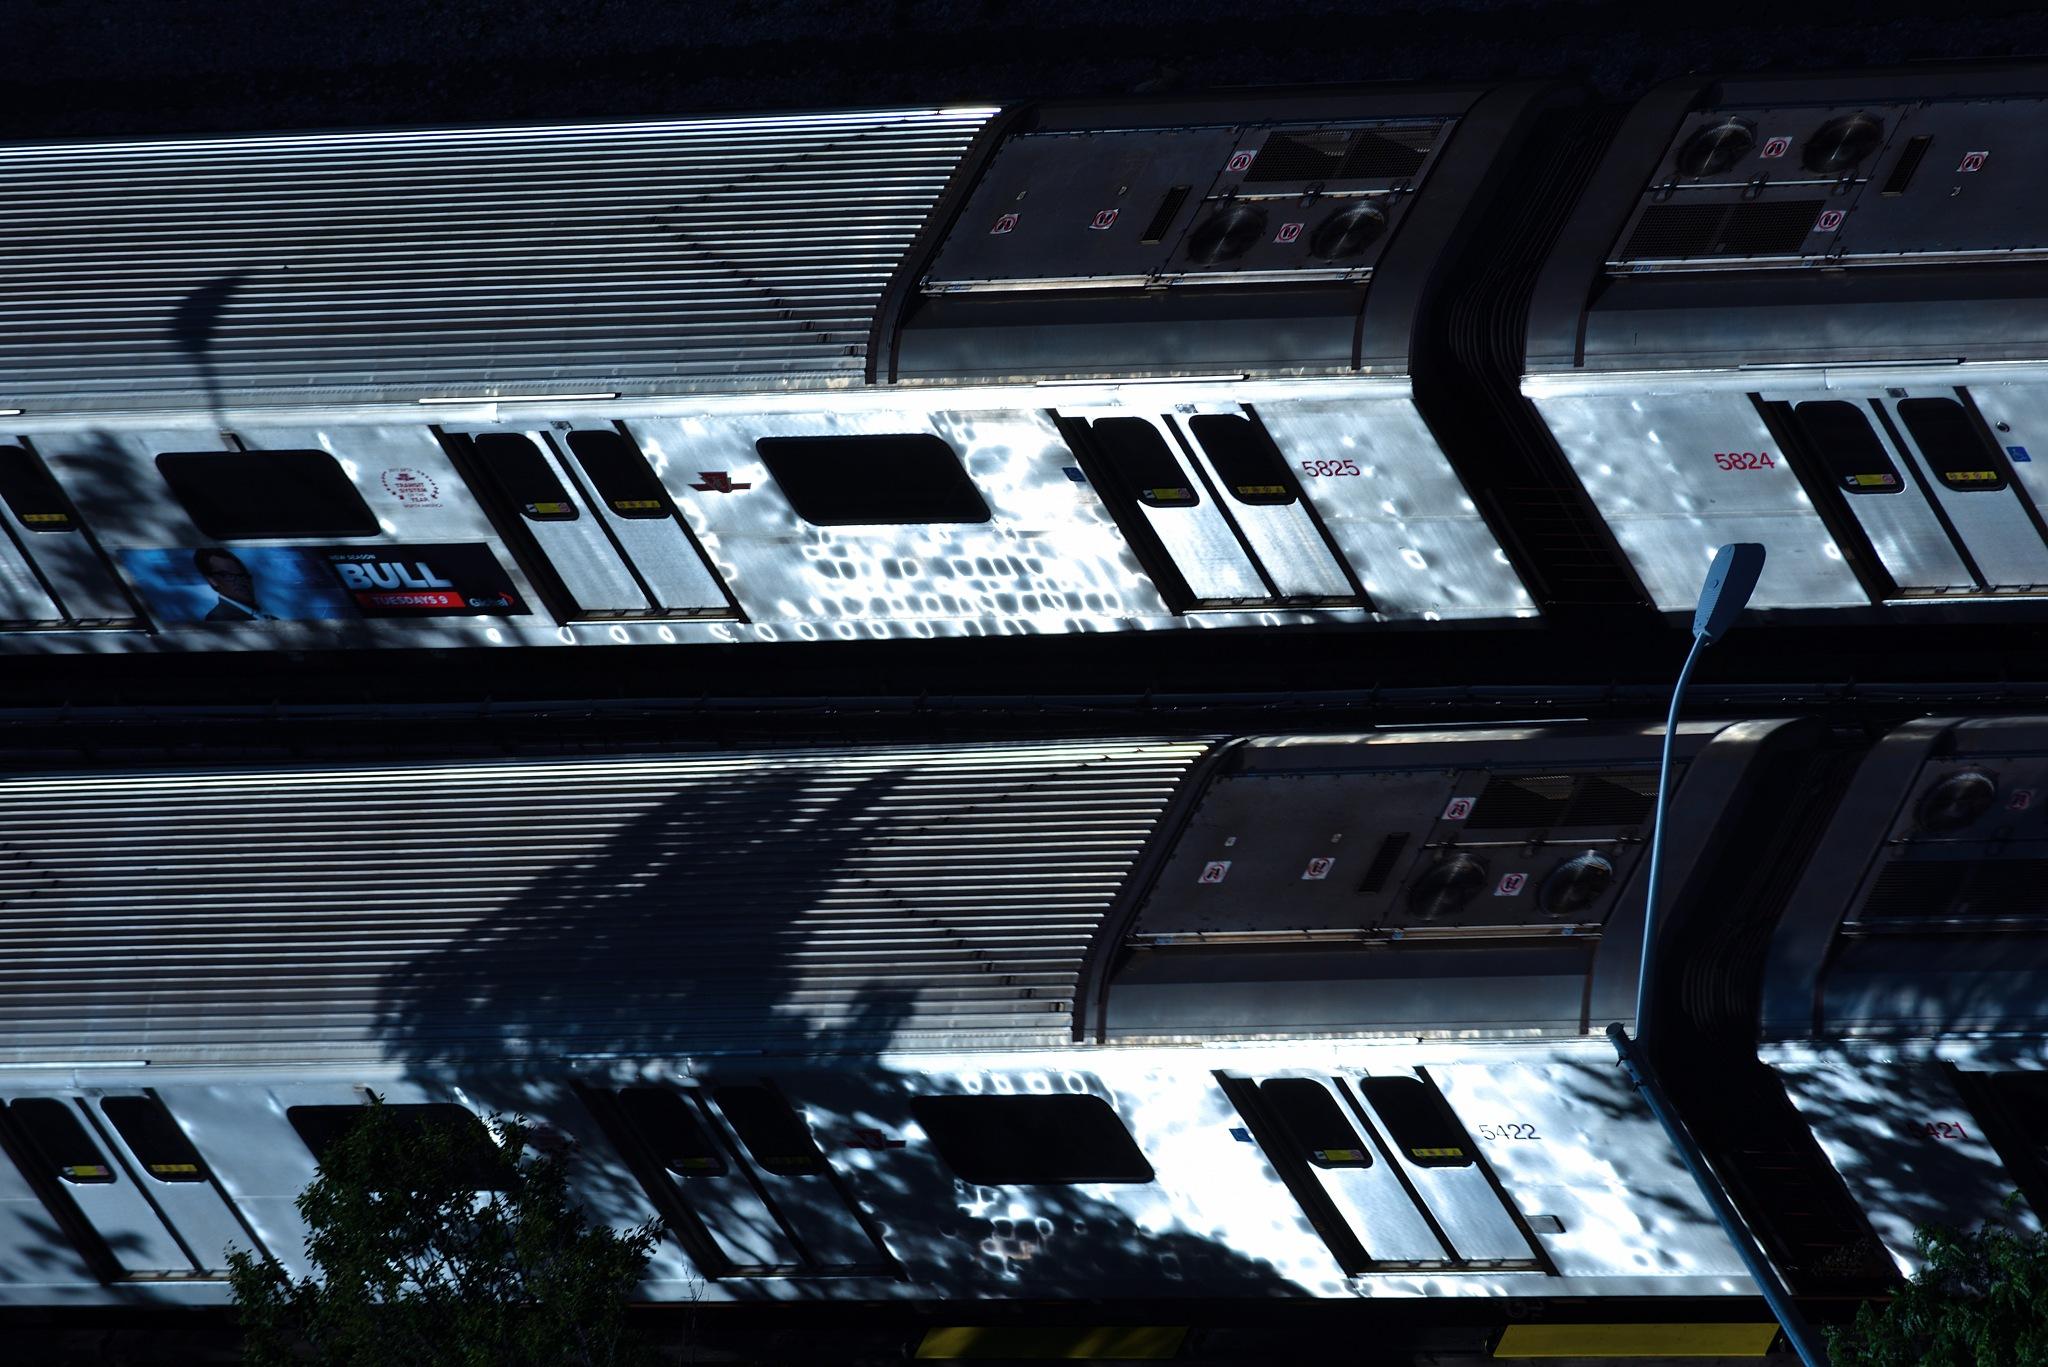 daylight subway by Y. Takei